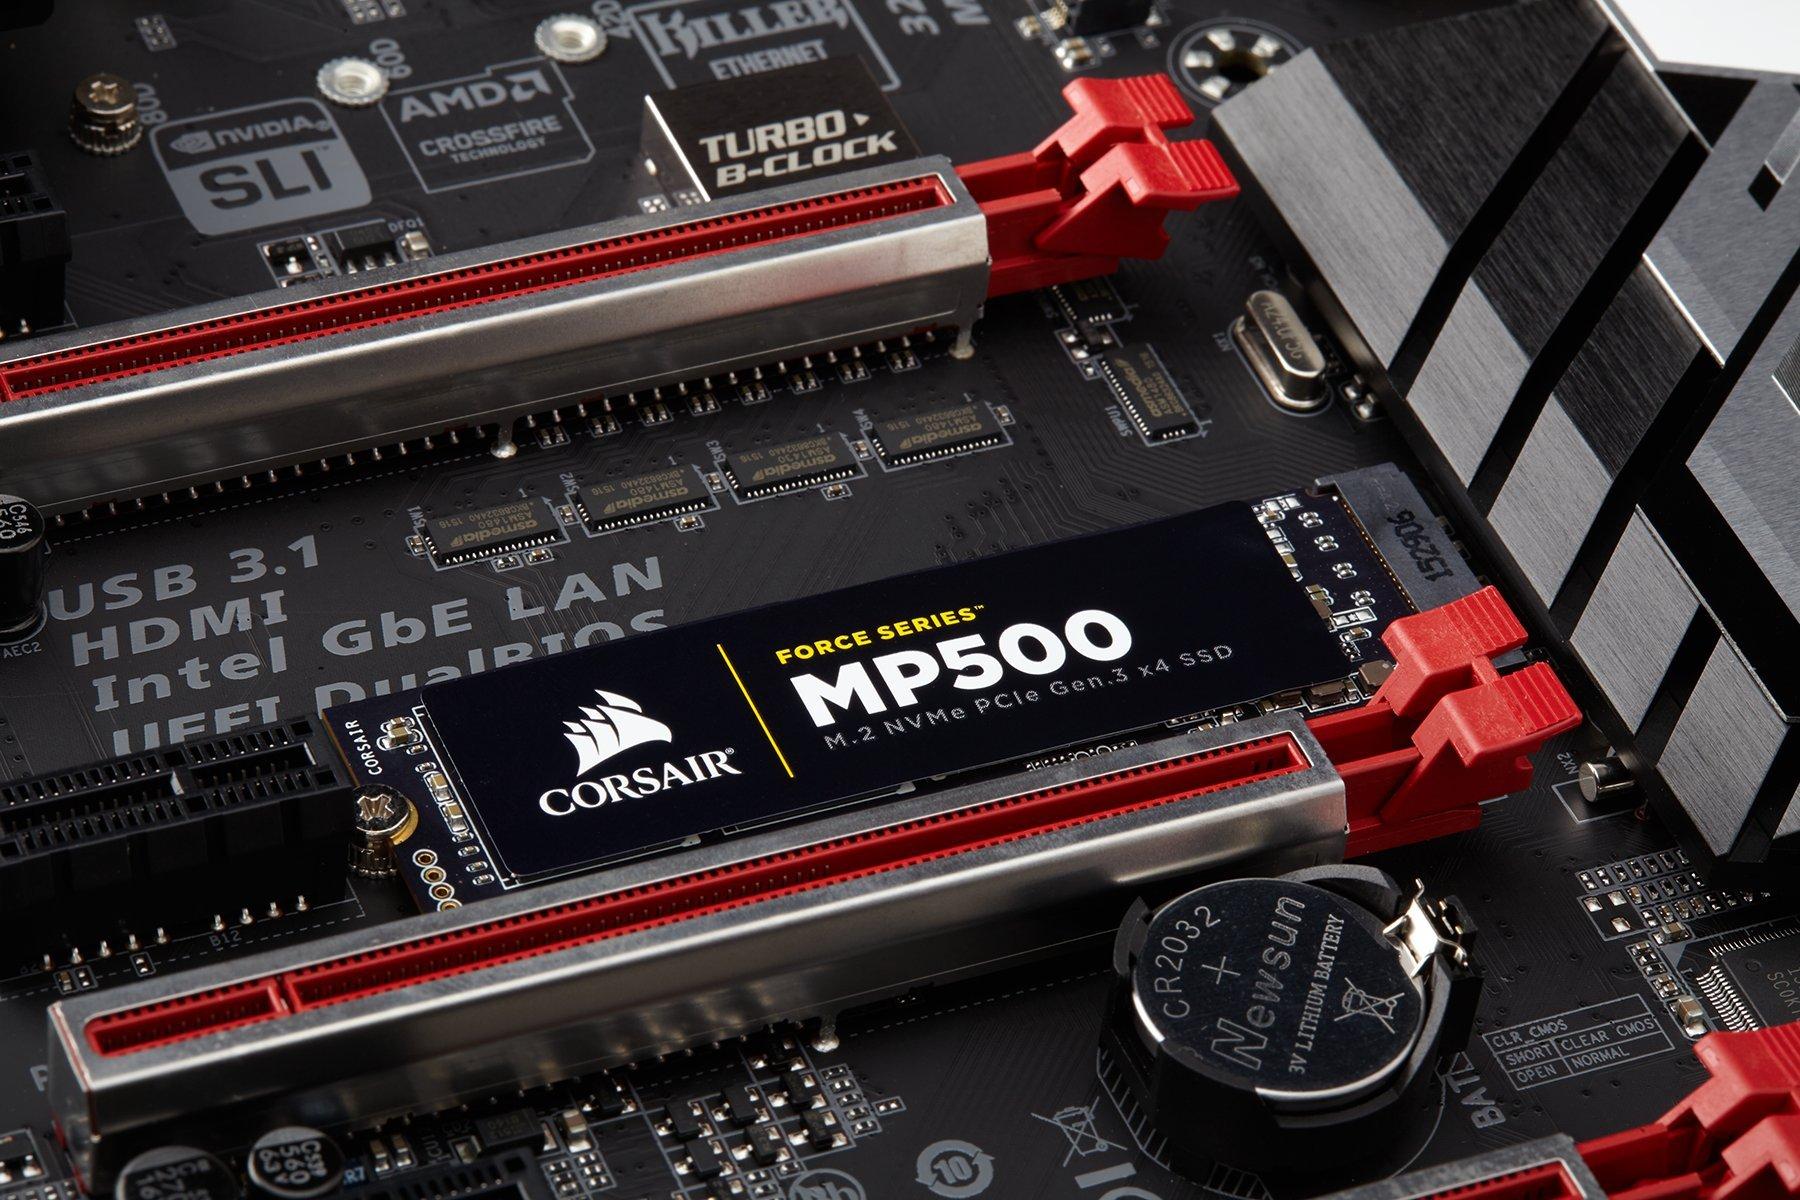 Corsair Force Series MP500 240GB M.2 NVMe PCIe Gen. 3 x4 SSD by Corsair (Image #6)